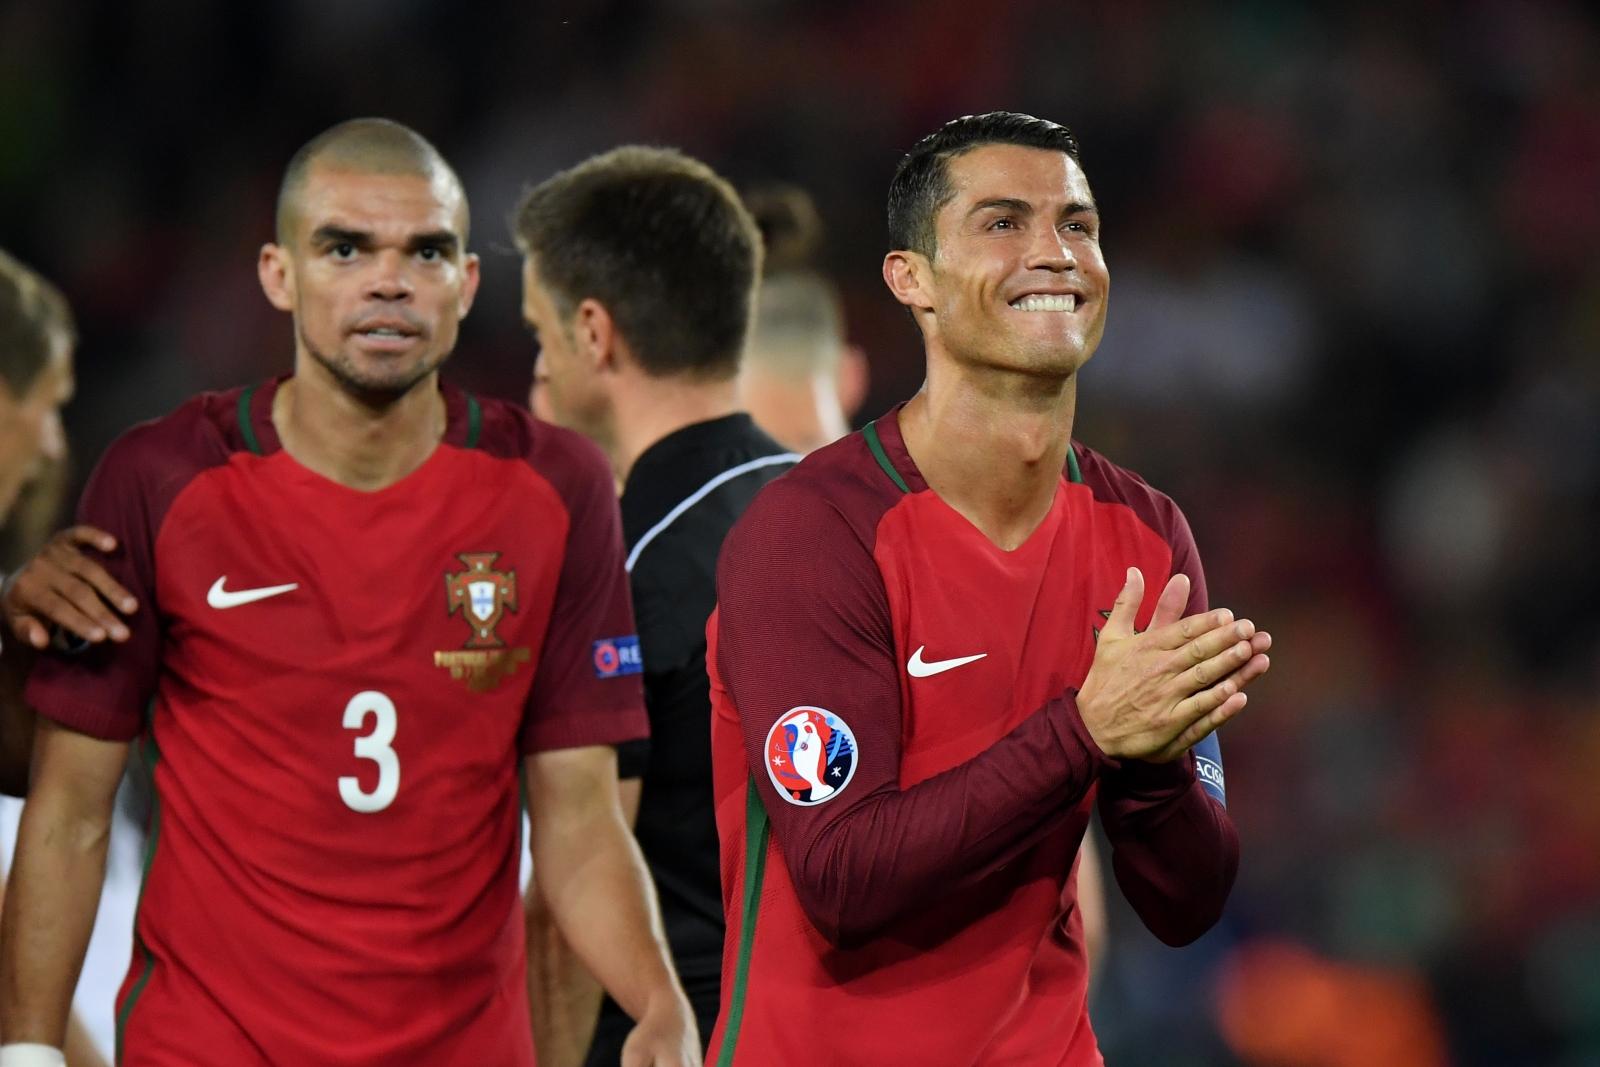 Ronaldo is awarded a penalty